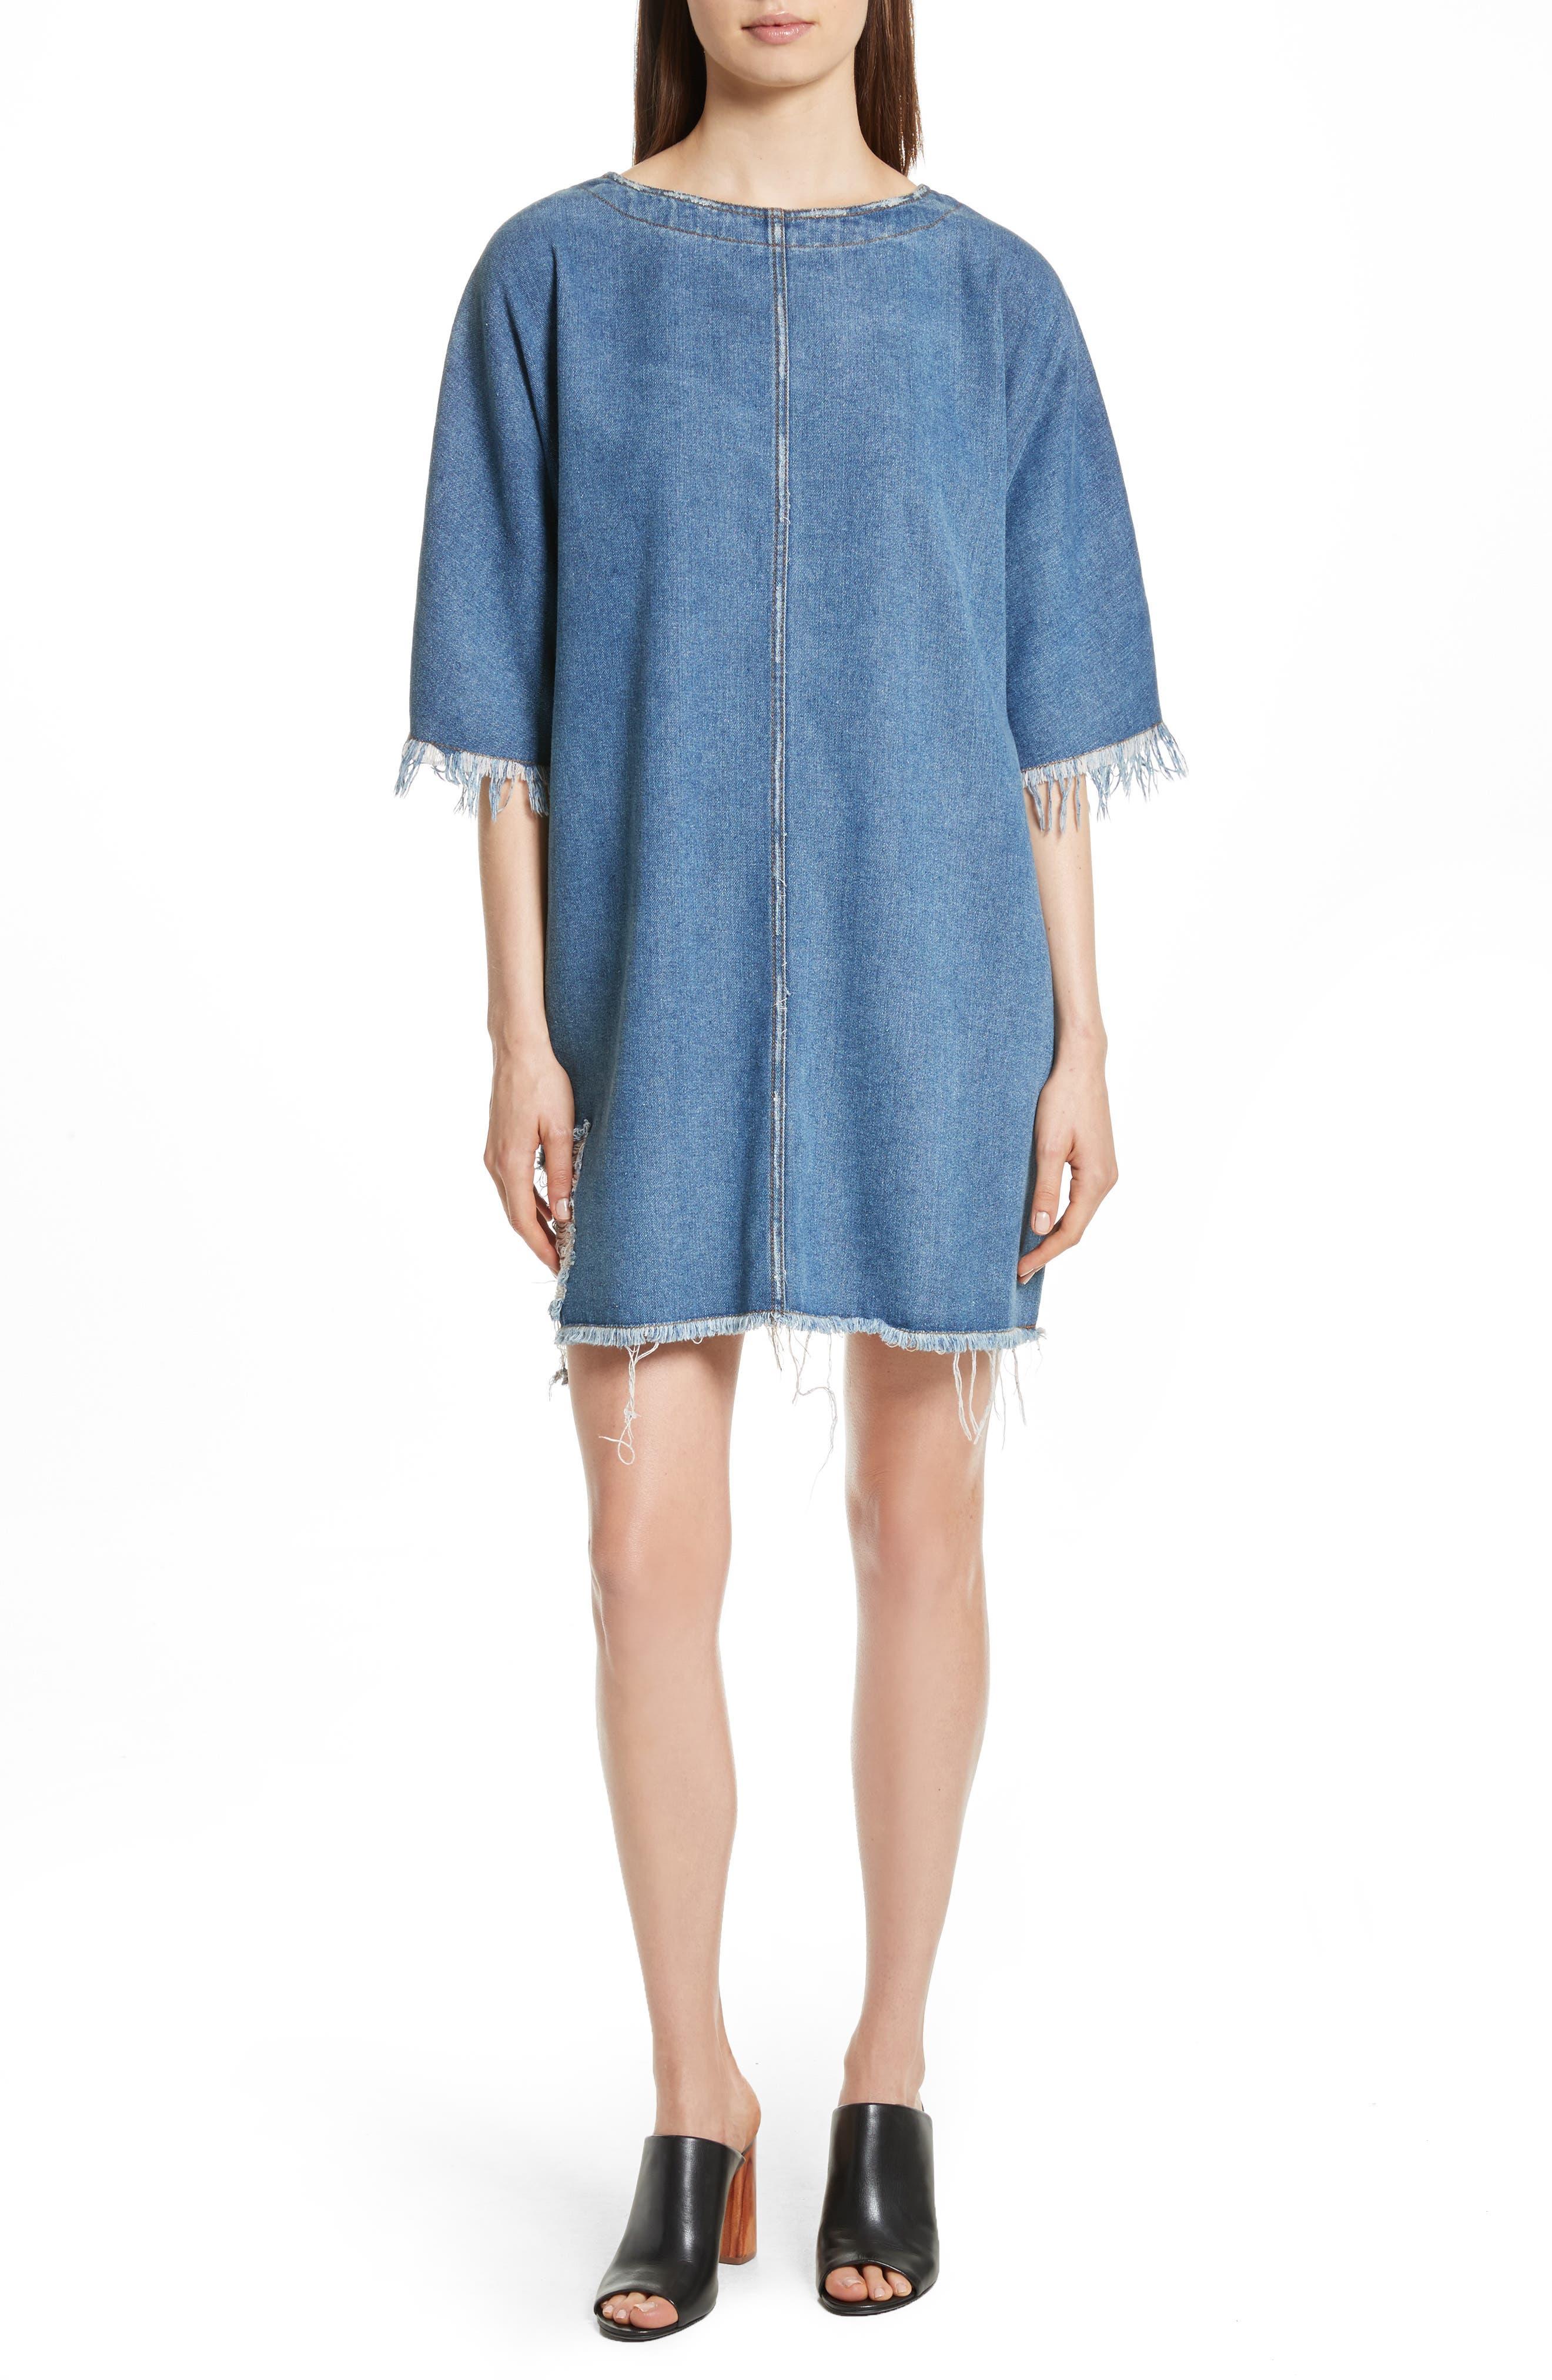 Distressed Denim Dress,                         Main,                         color, Light Denim Wash